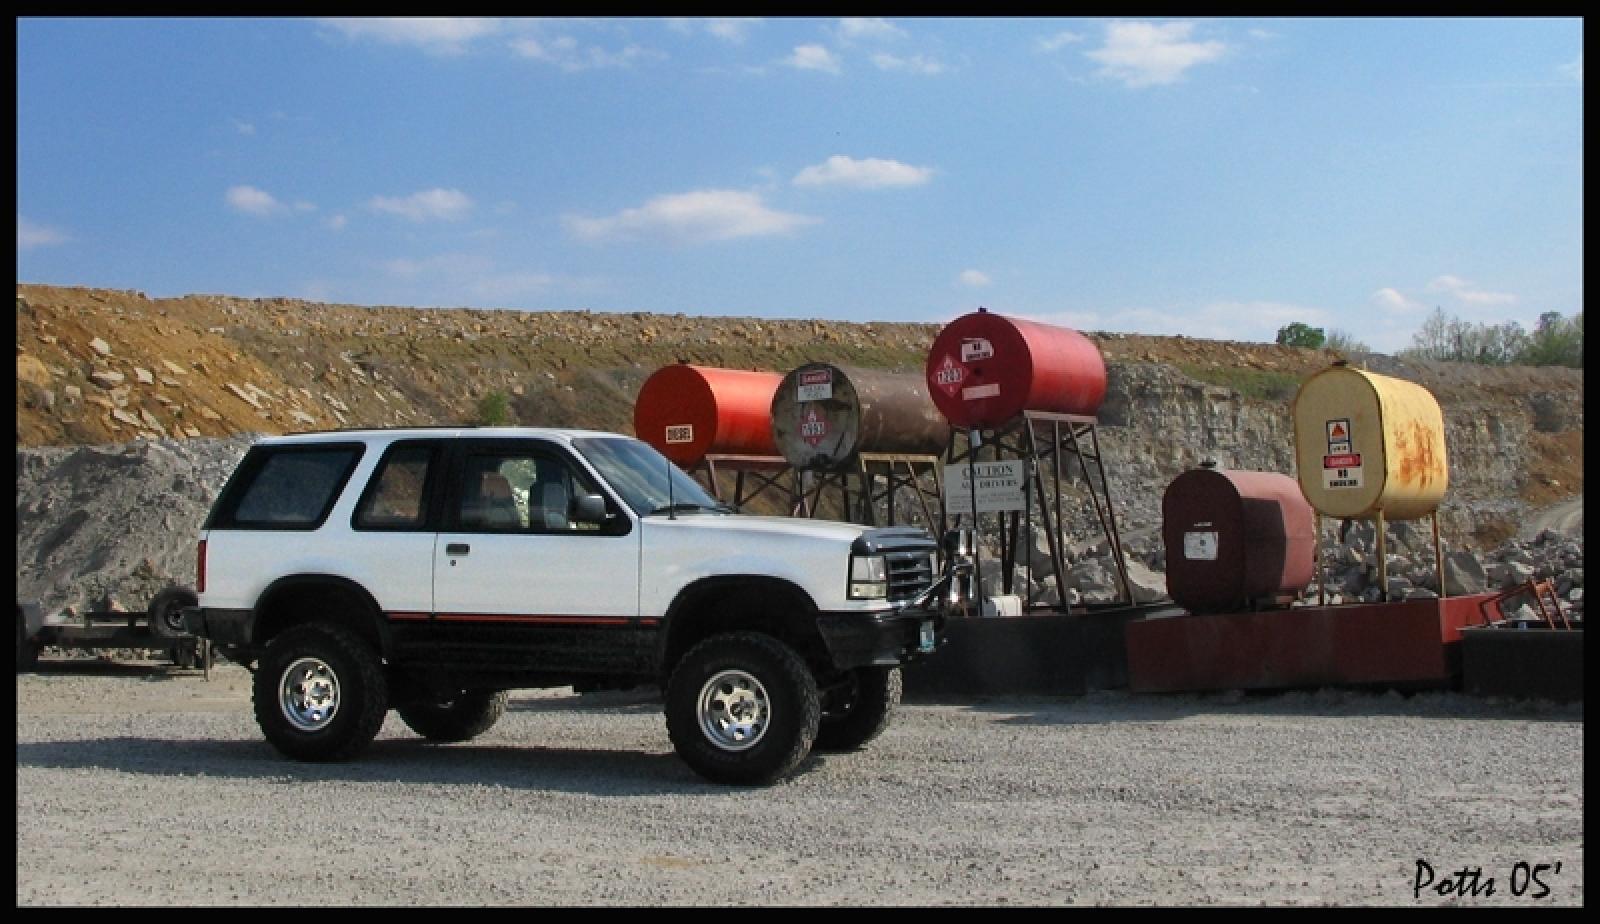 800 1024 1280 1600 origin 1992 ford explorer